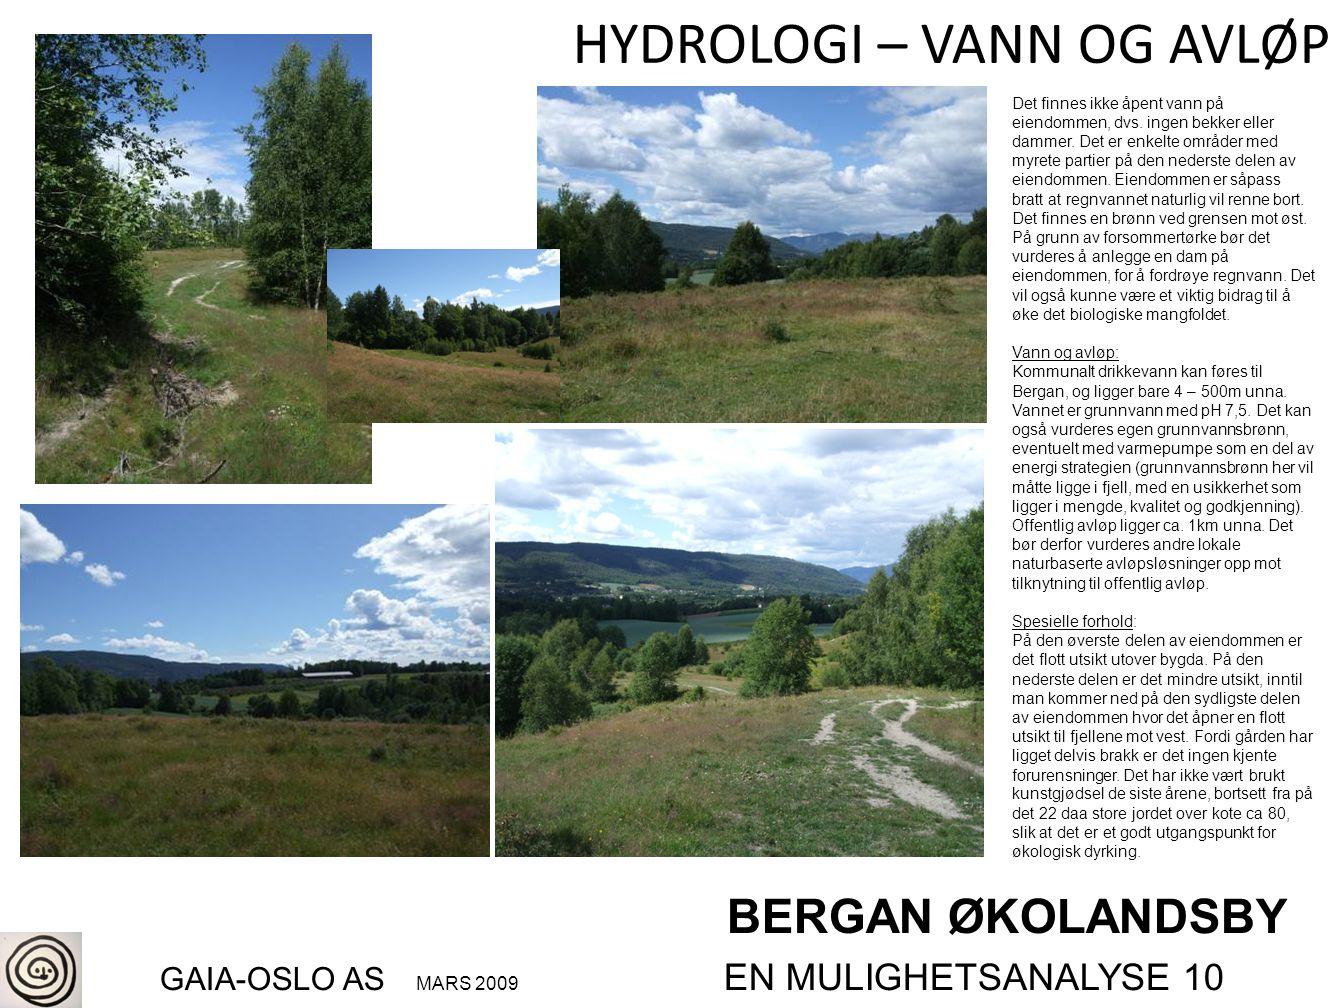 BERGAN ØKOLANDSBY GAIA-OSLO AS MARS 2009 EN MULIGHETSANALYSE 10